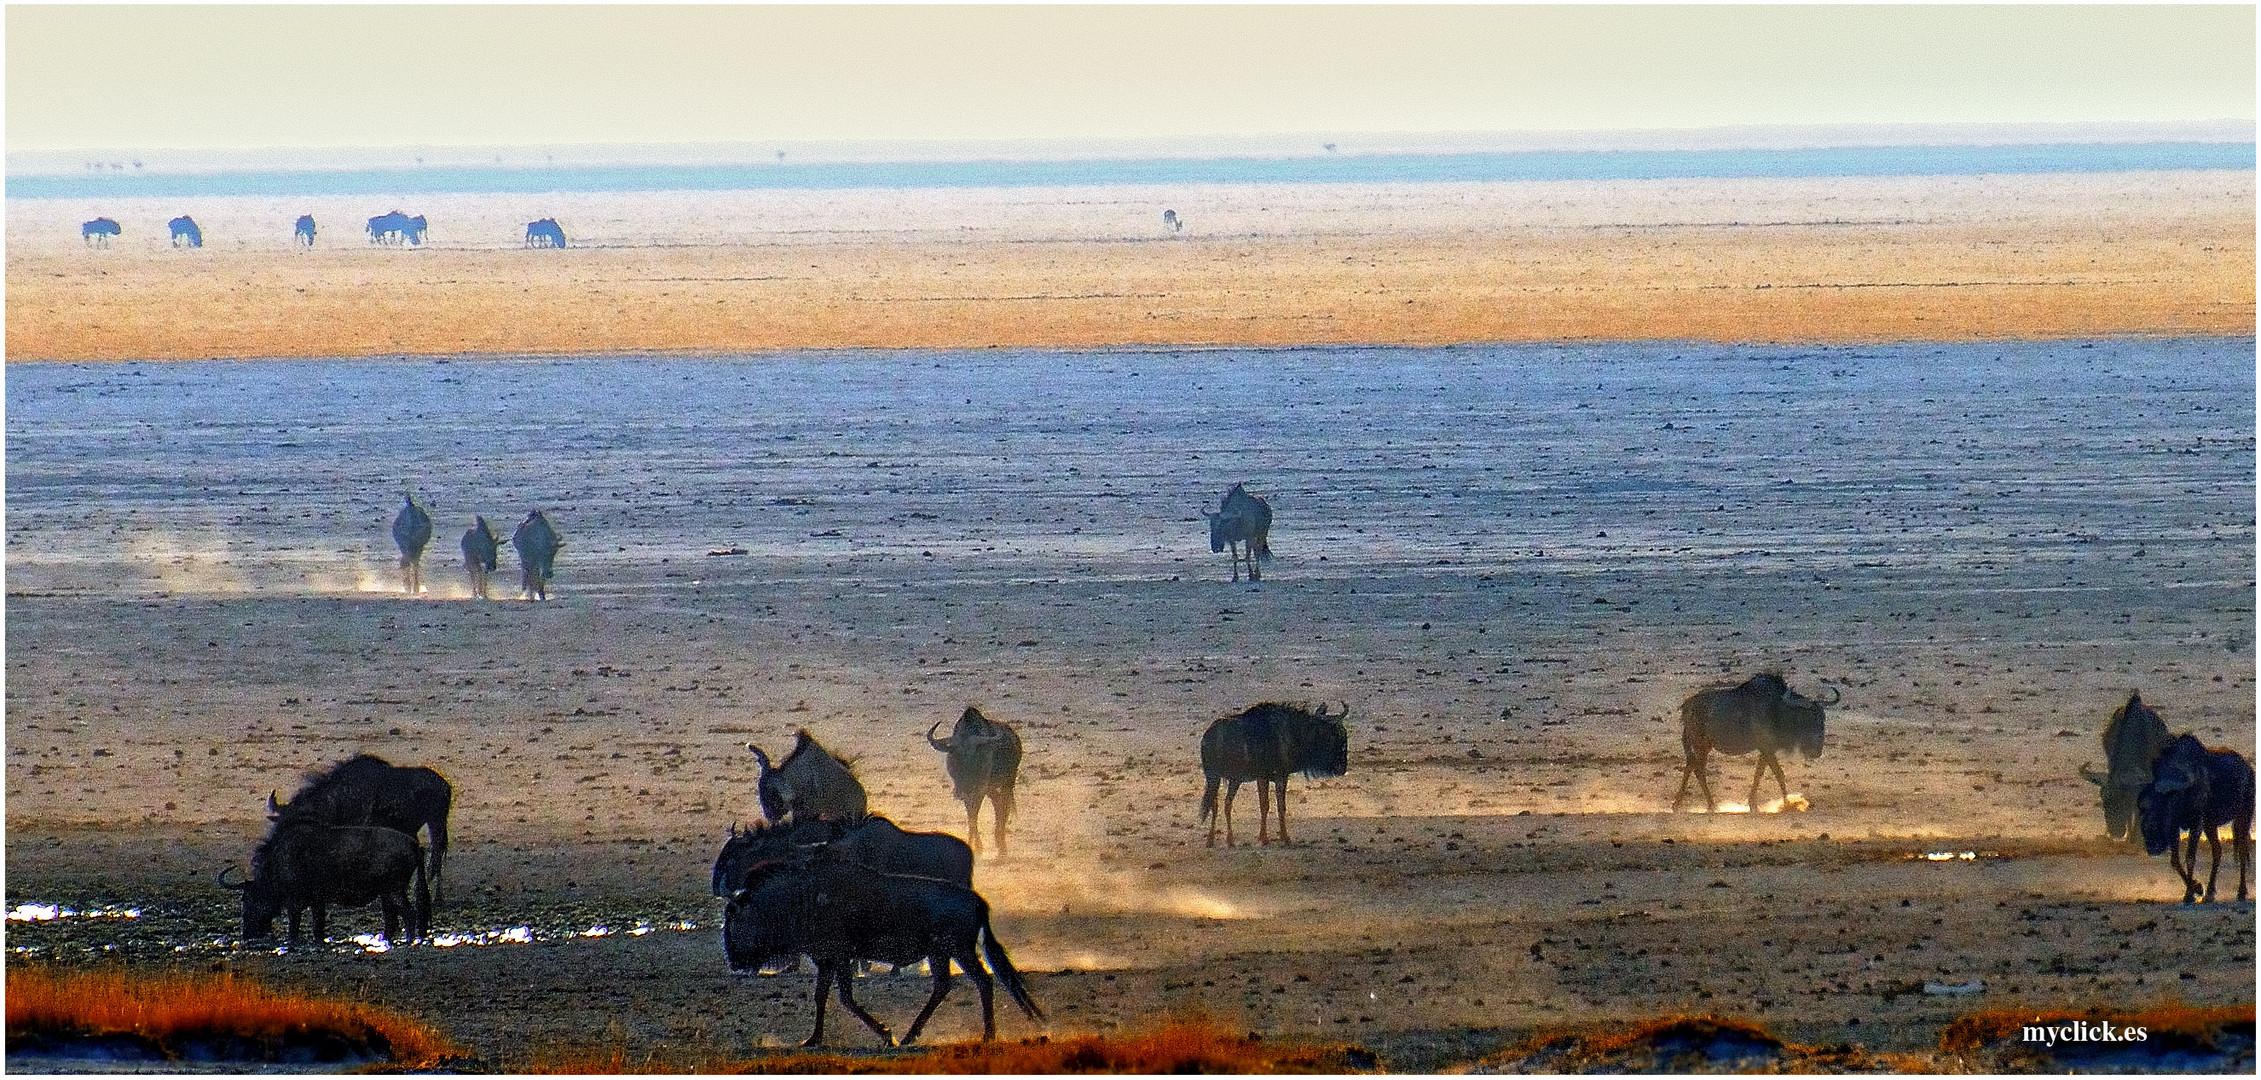 MEMORIAS DE AFRICA-ÑUS AL AMANECER-PN ETHOSA NAMIBIA